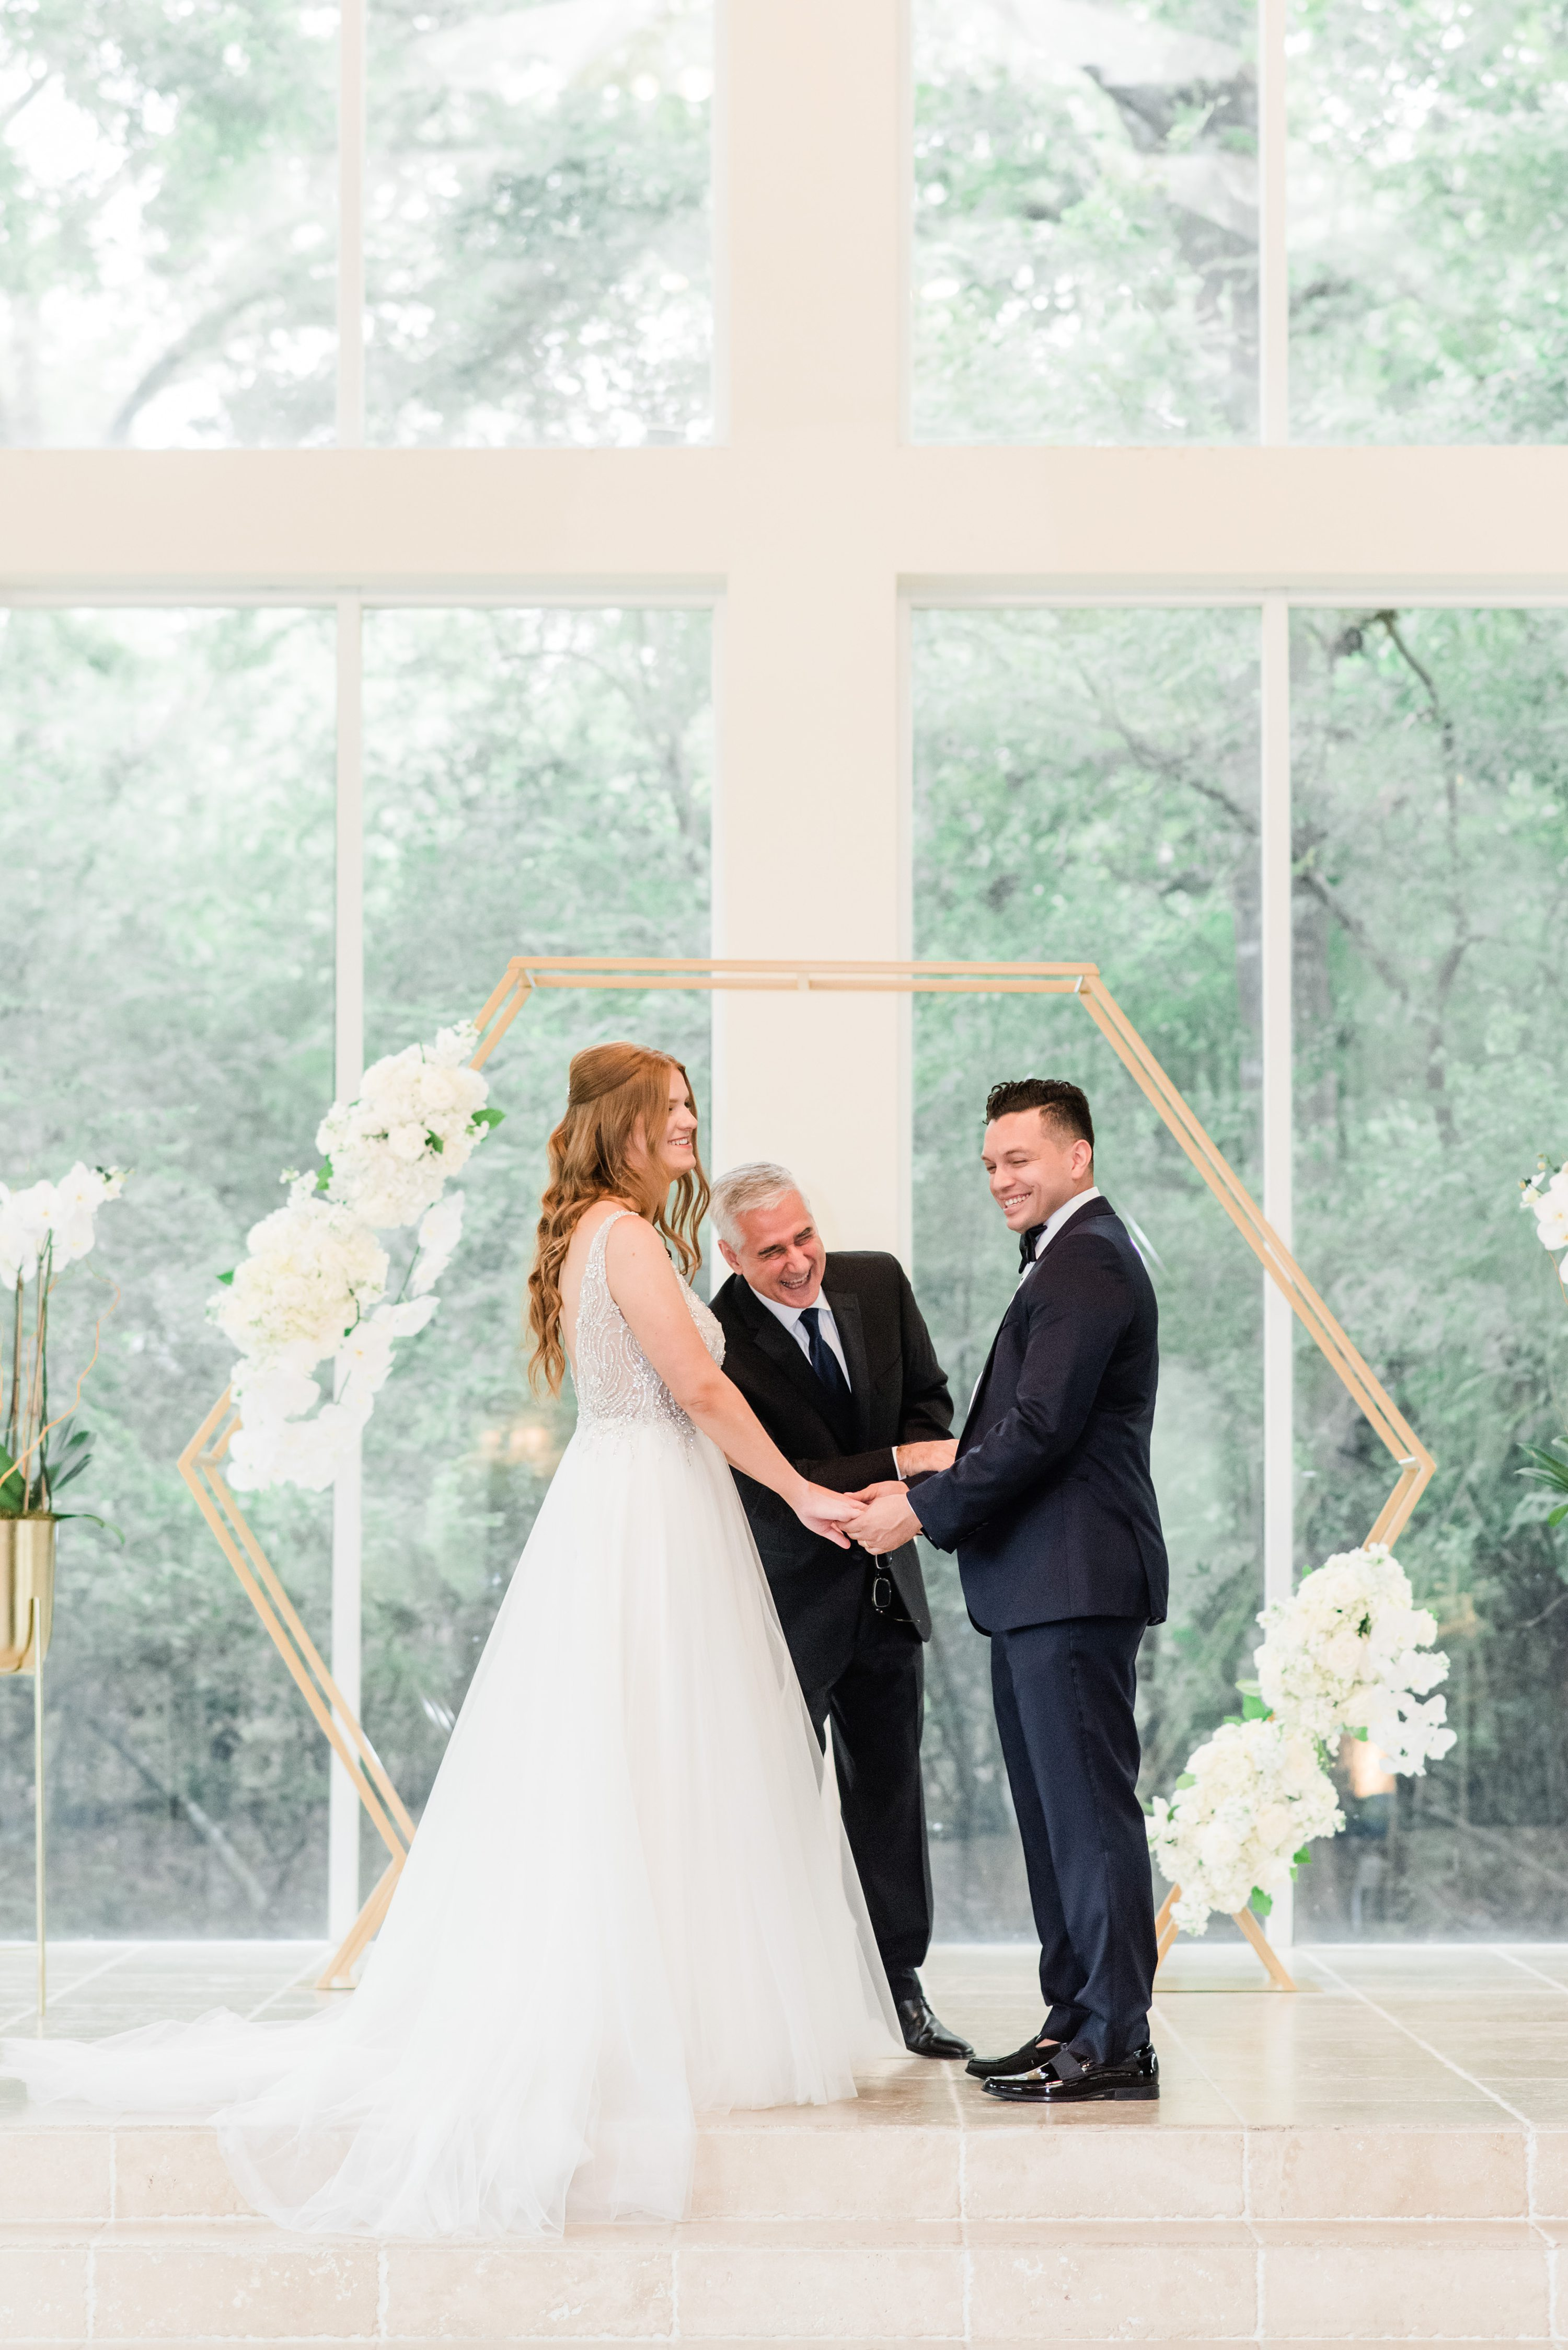 Houston Wedding Photography,Husband & Wife Team